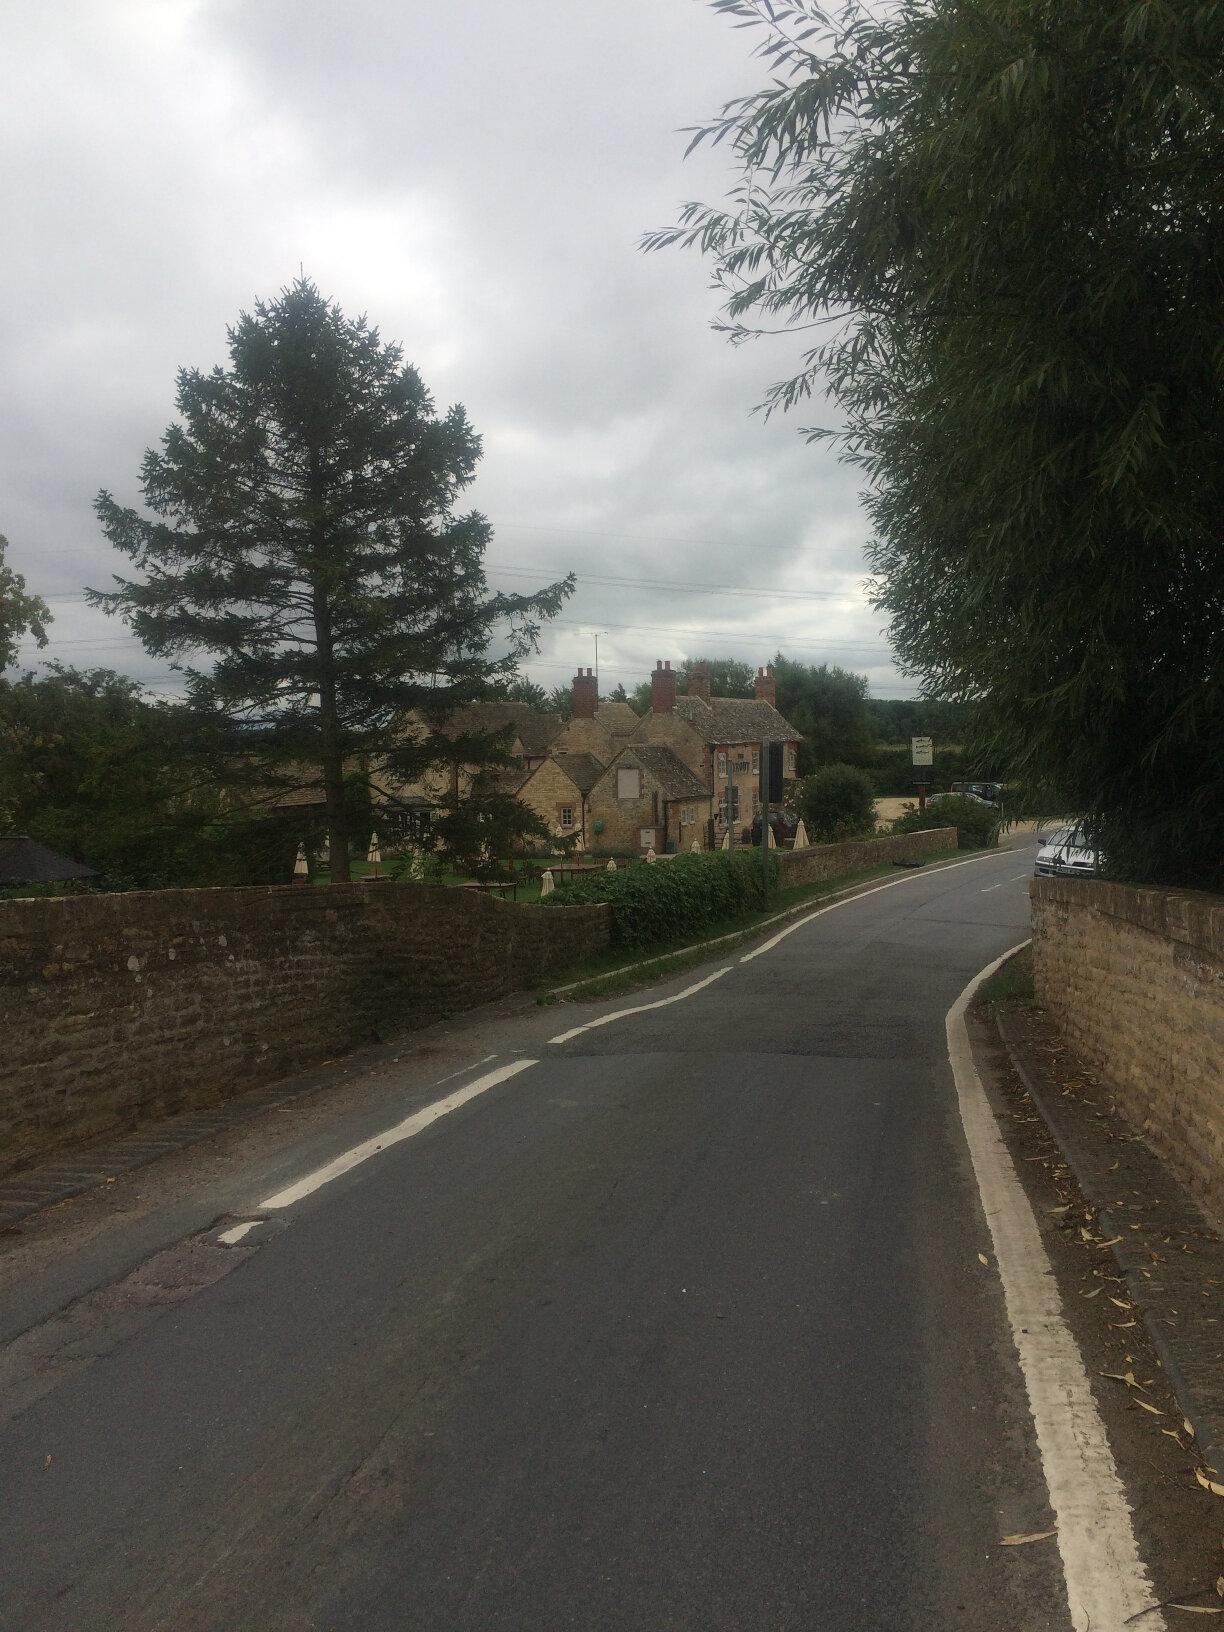 From Lechlade to Newbridge (42)